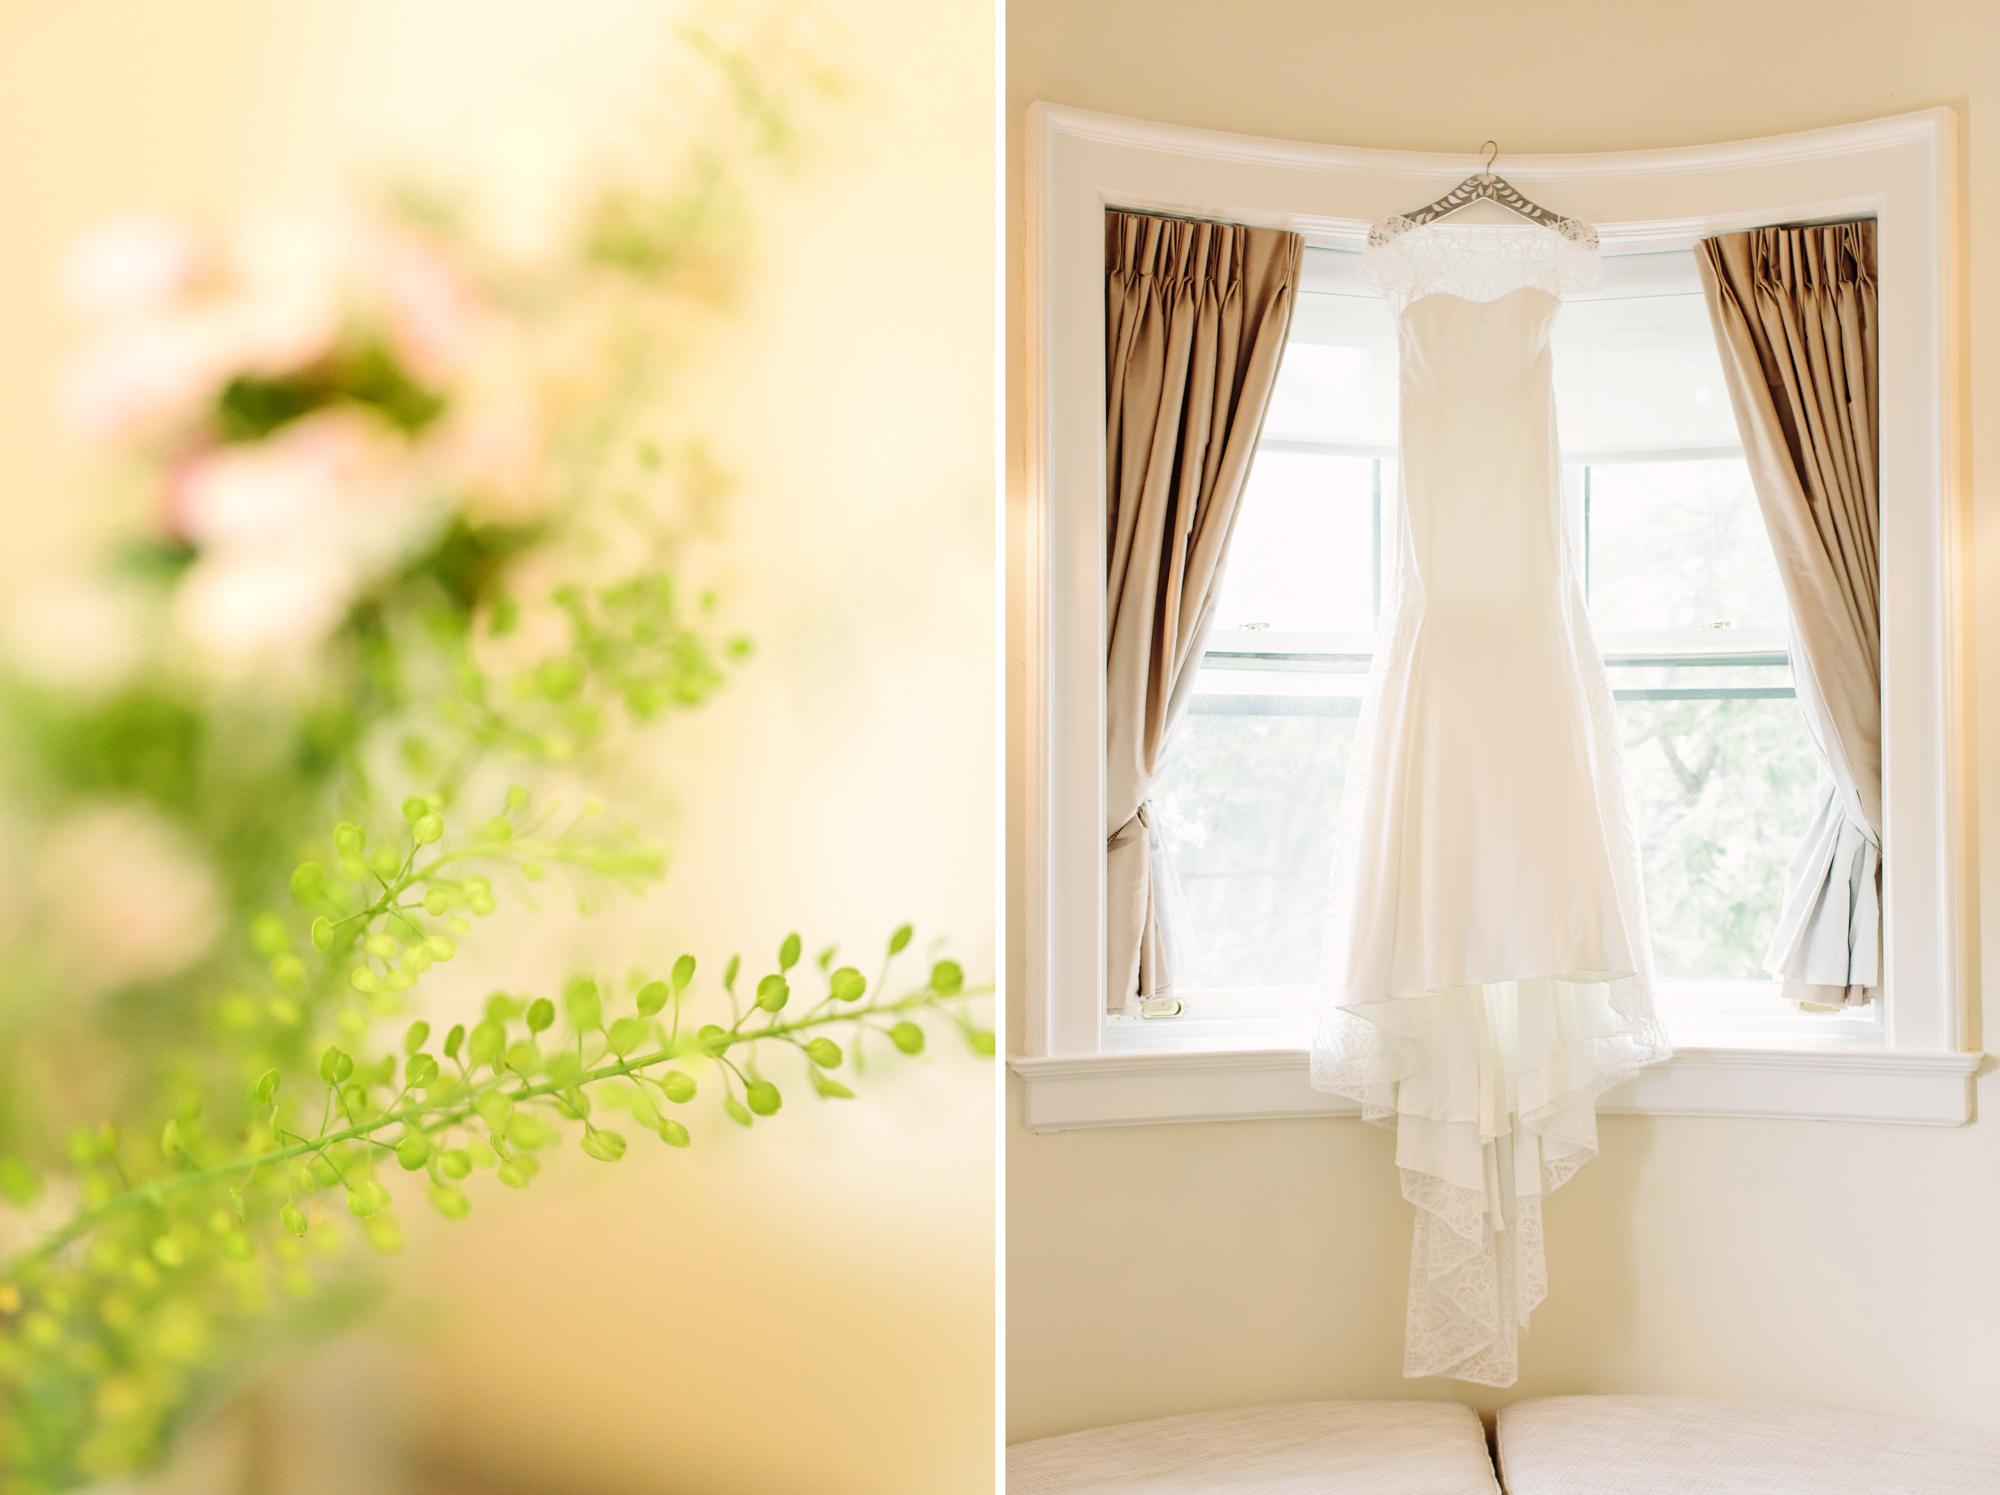 03_Jessica_Ted_Blue_Hill_Stone_Barns_Wedding_Pocantico_NY_Tanya_Salazar_Photography.jpg